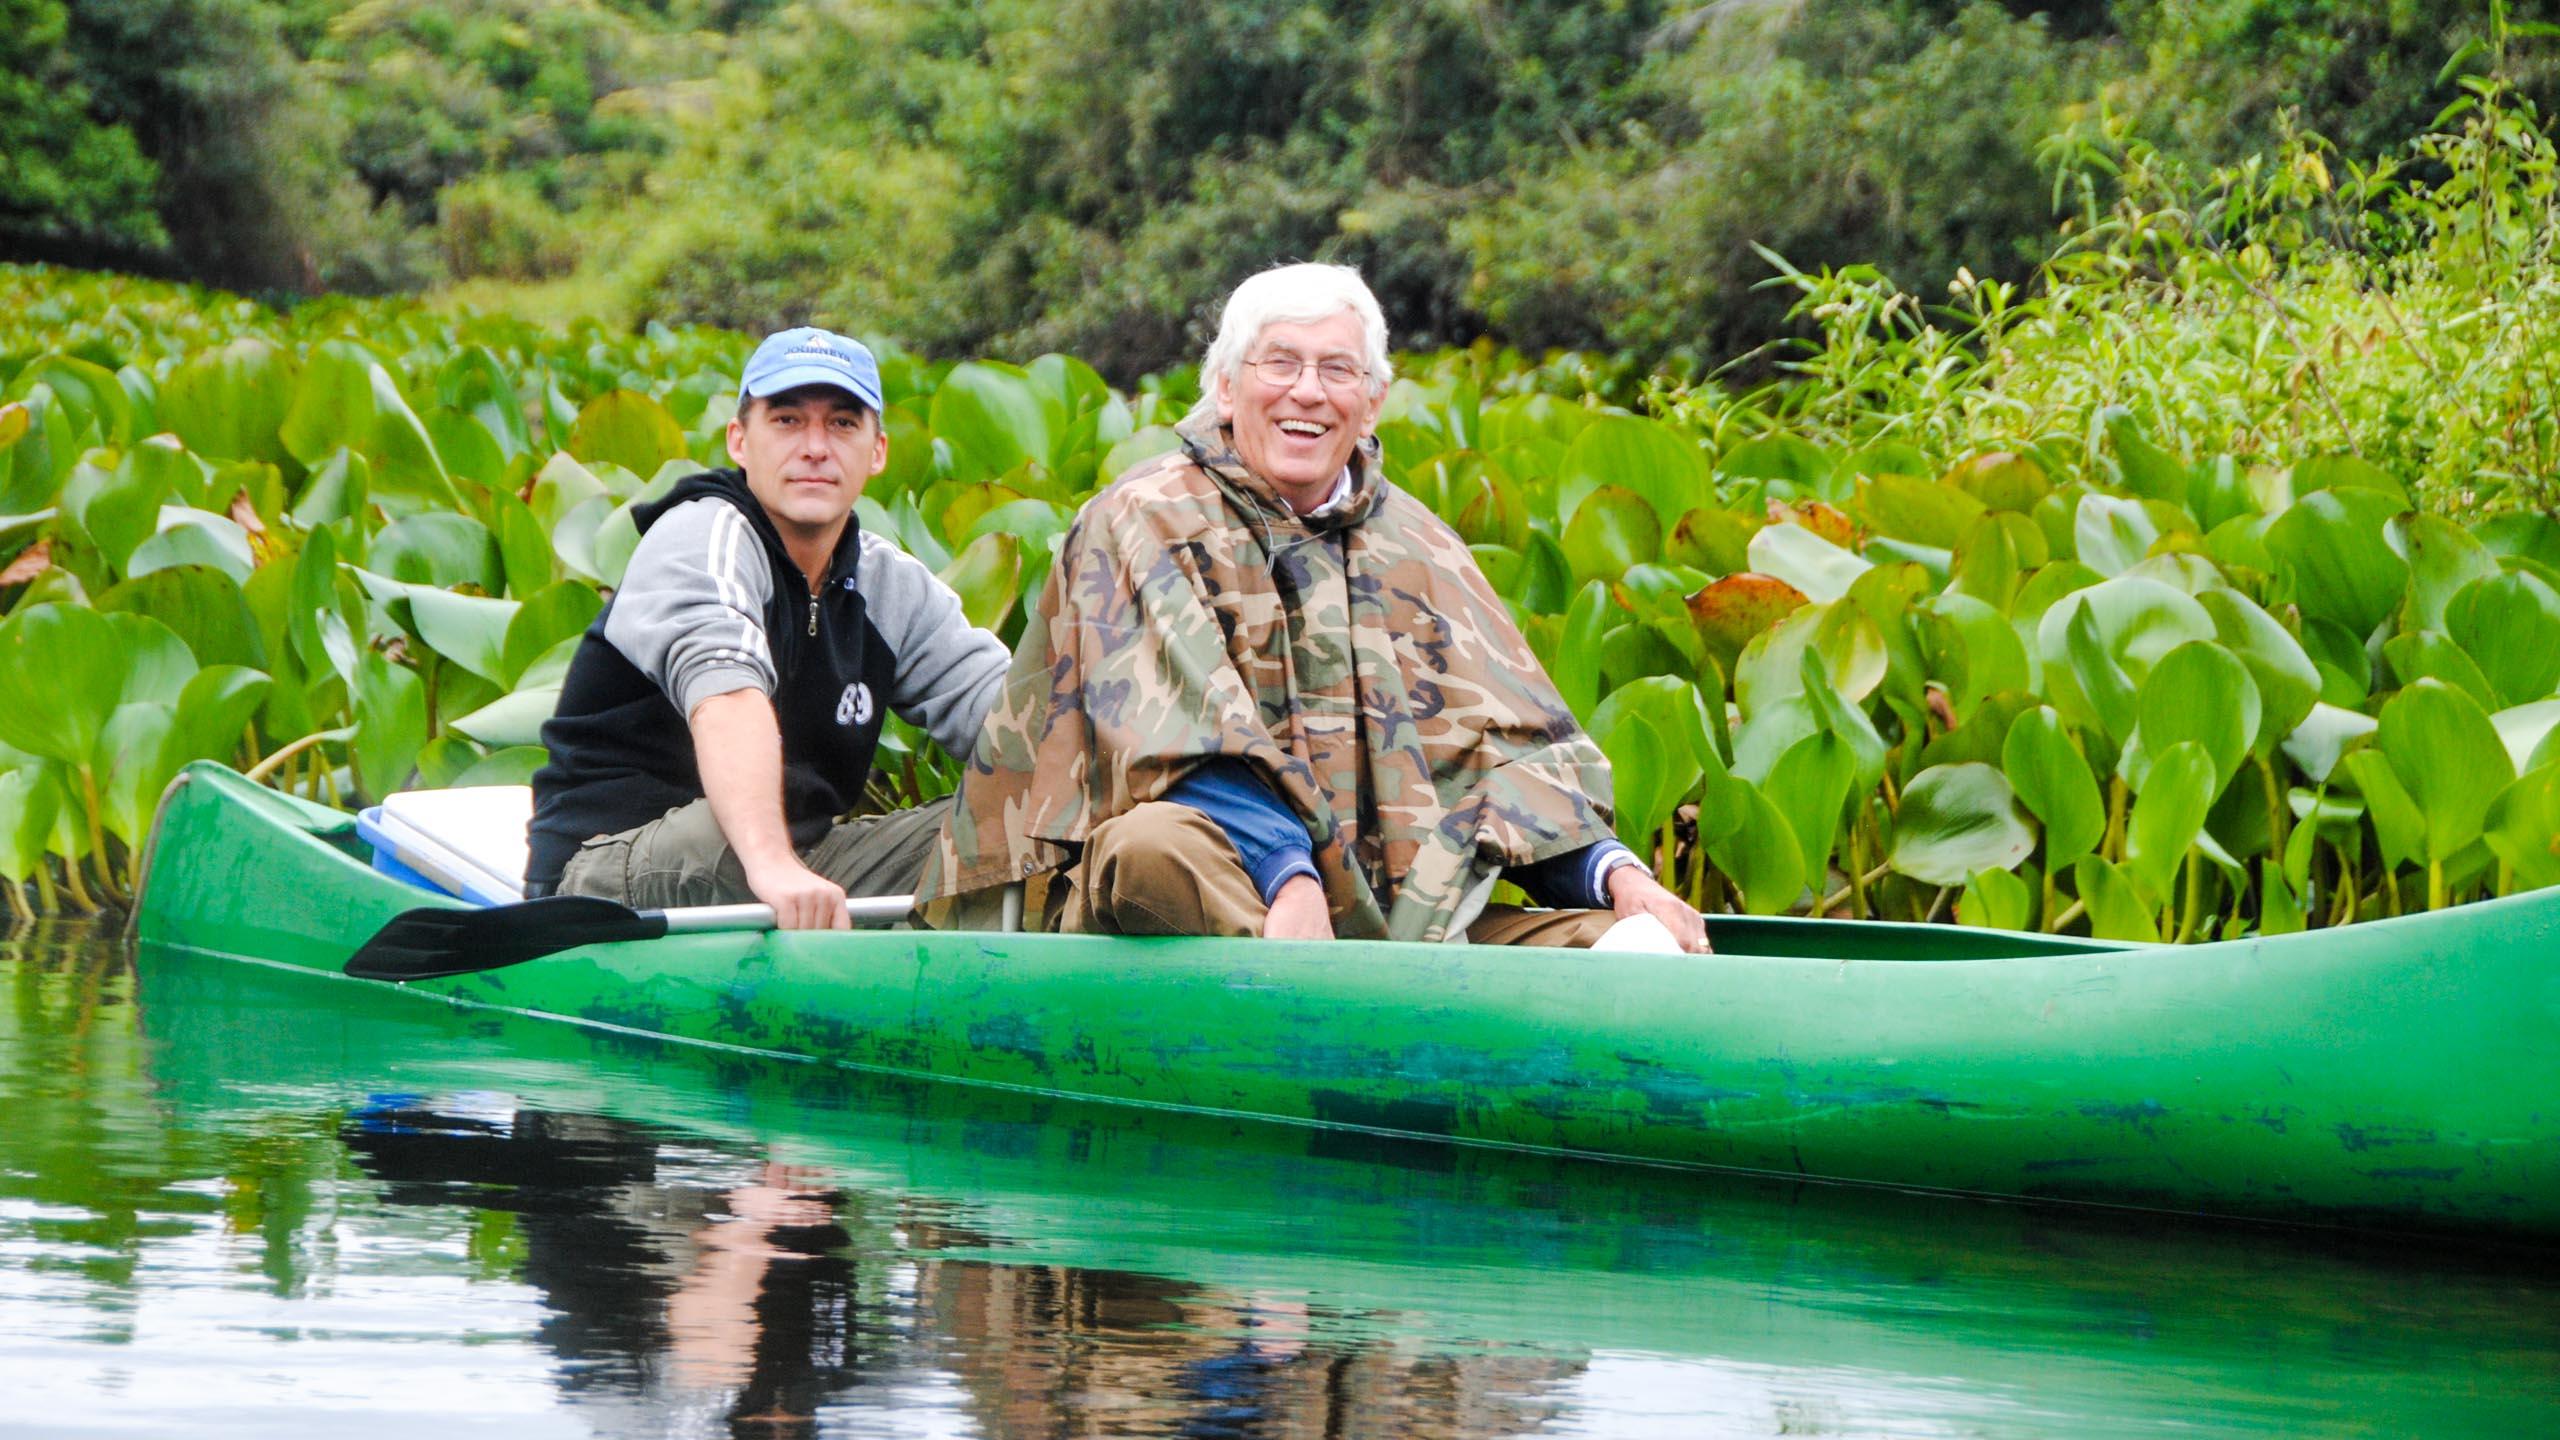 Travelers in canoe on Brazil trip